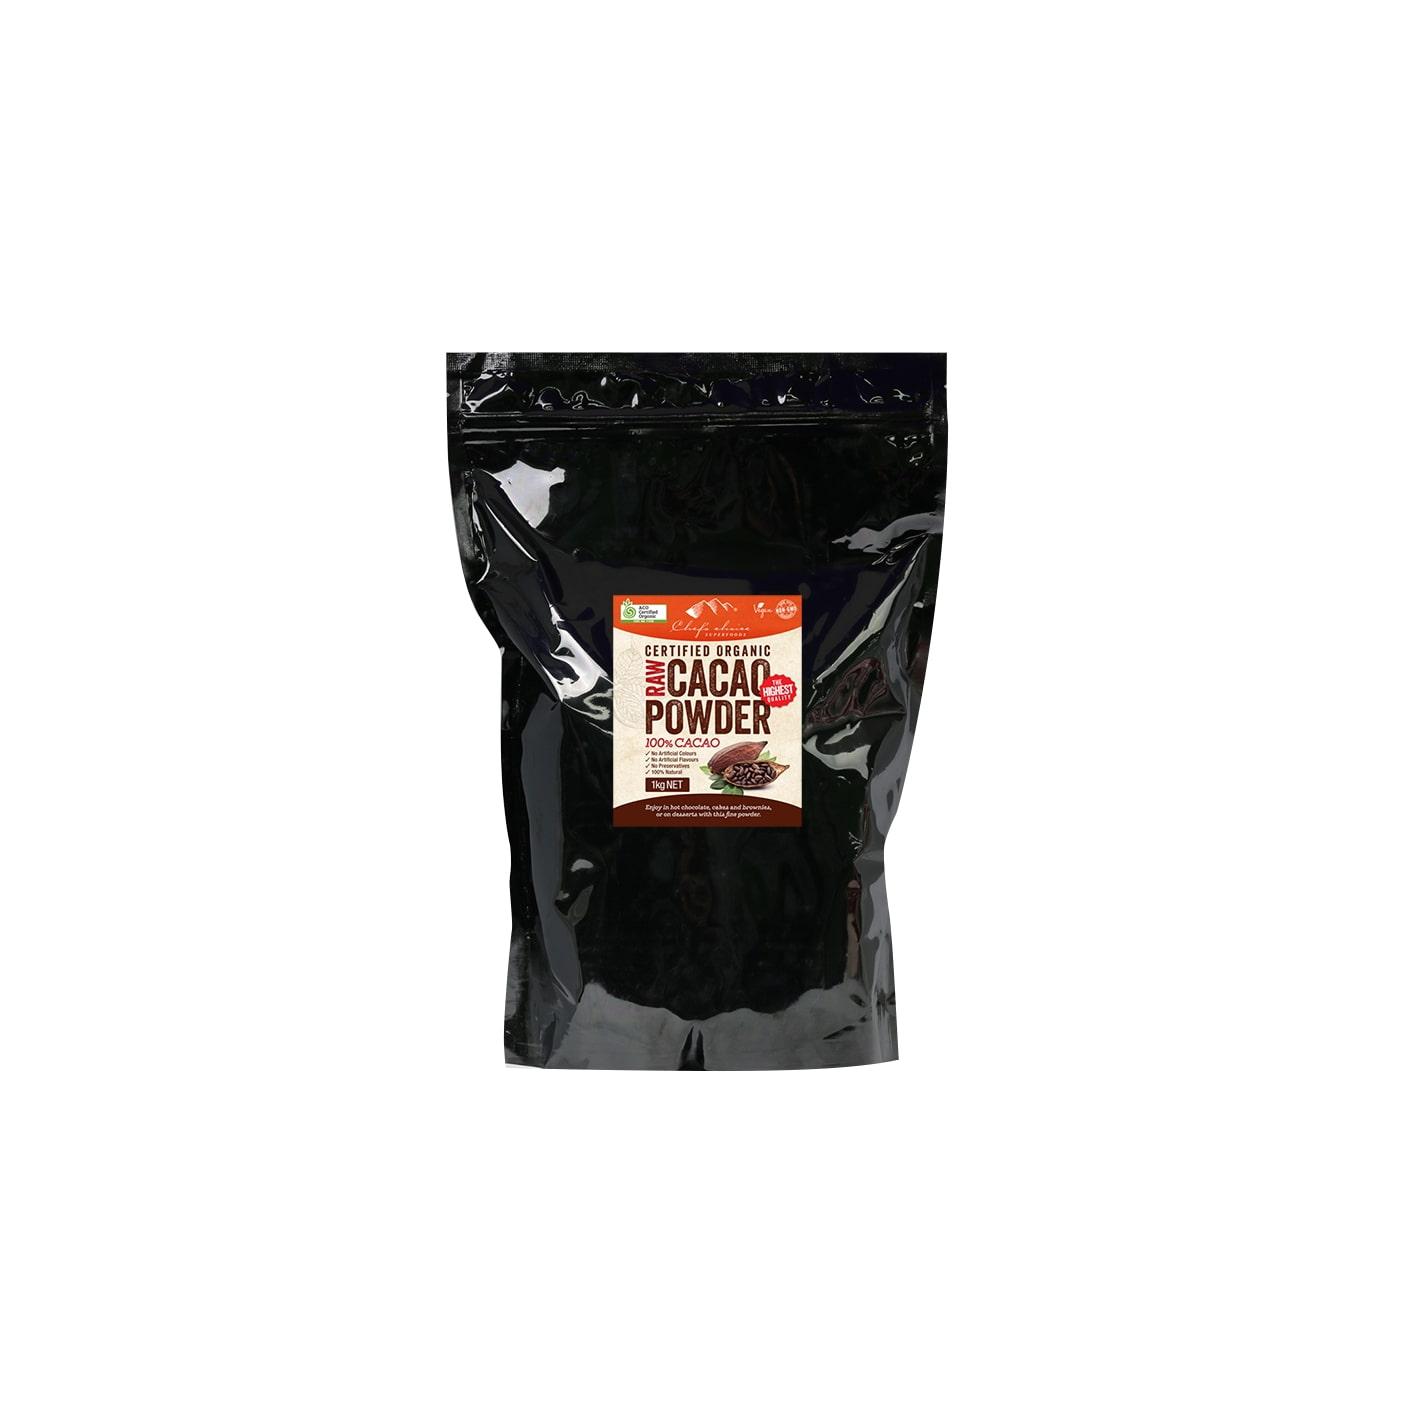 Raw Organic CACAO Powder 100% Cocoa (20-22%) 1Kg